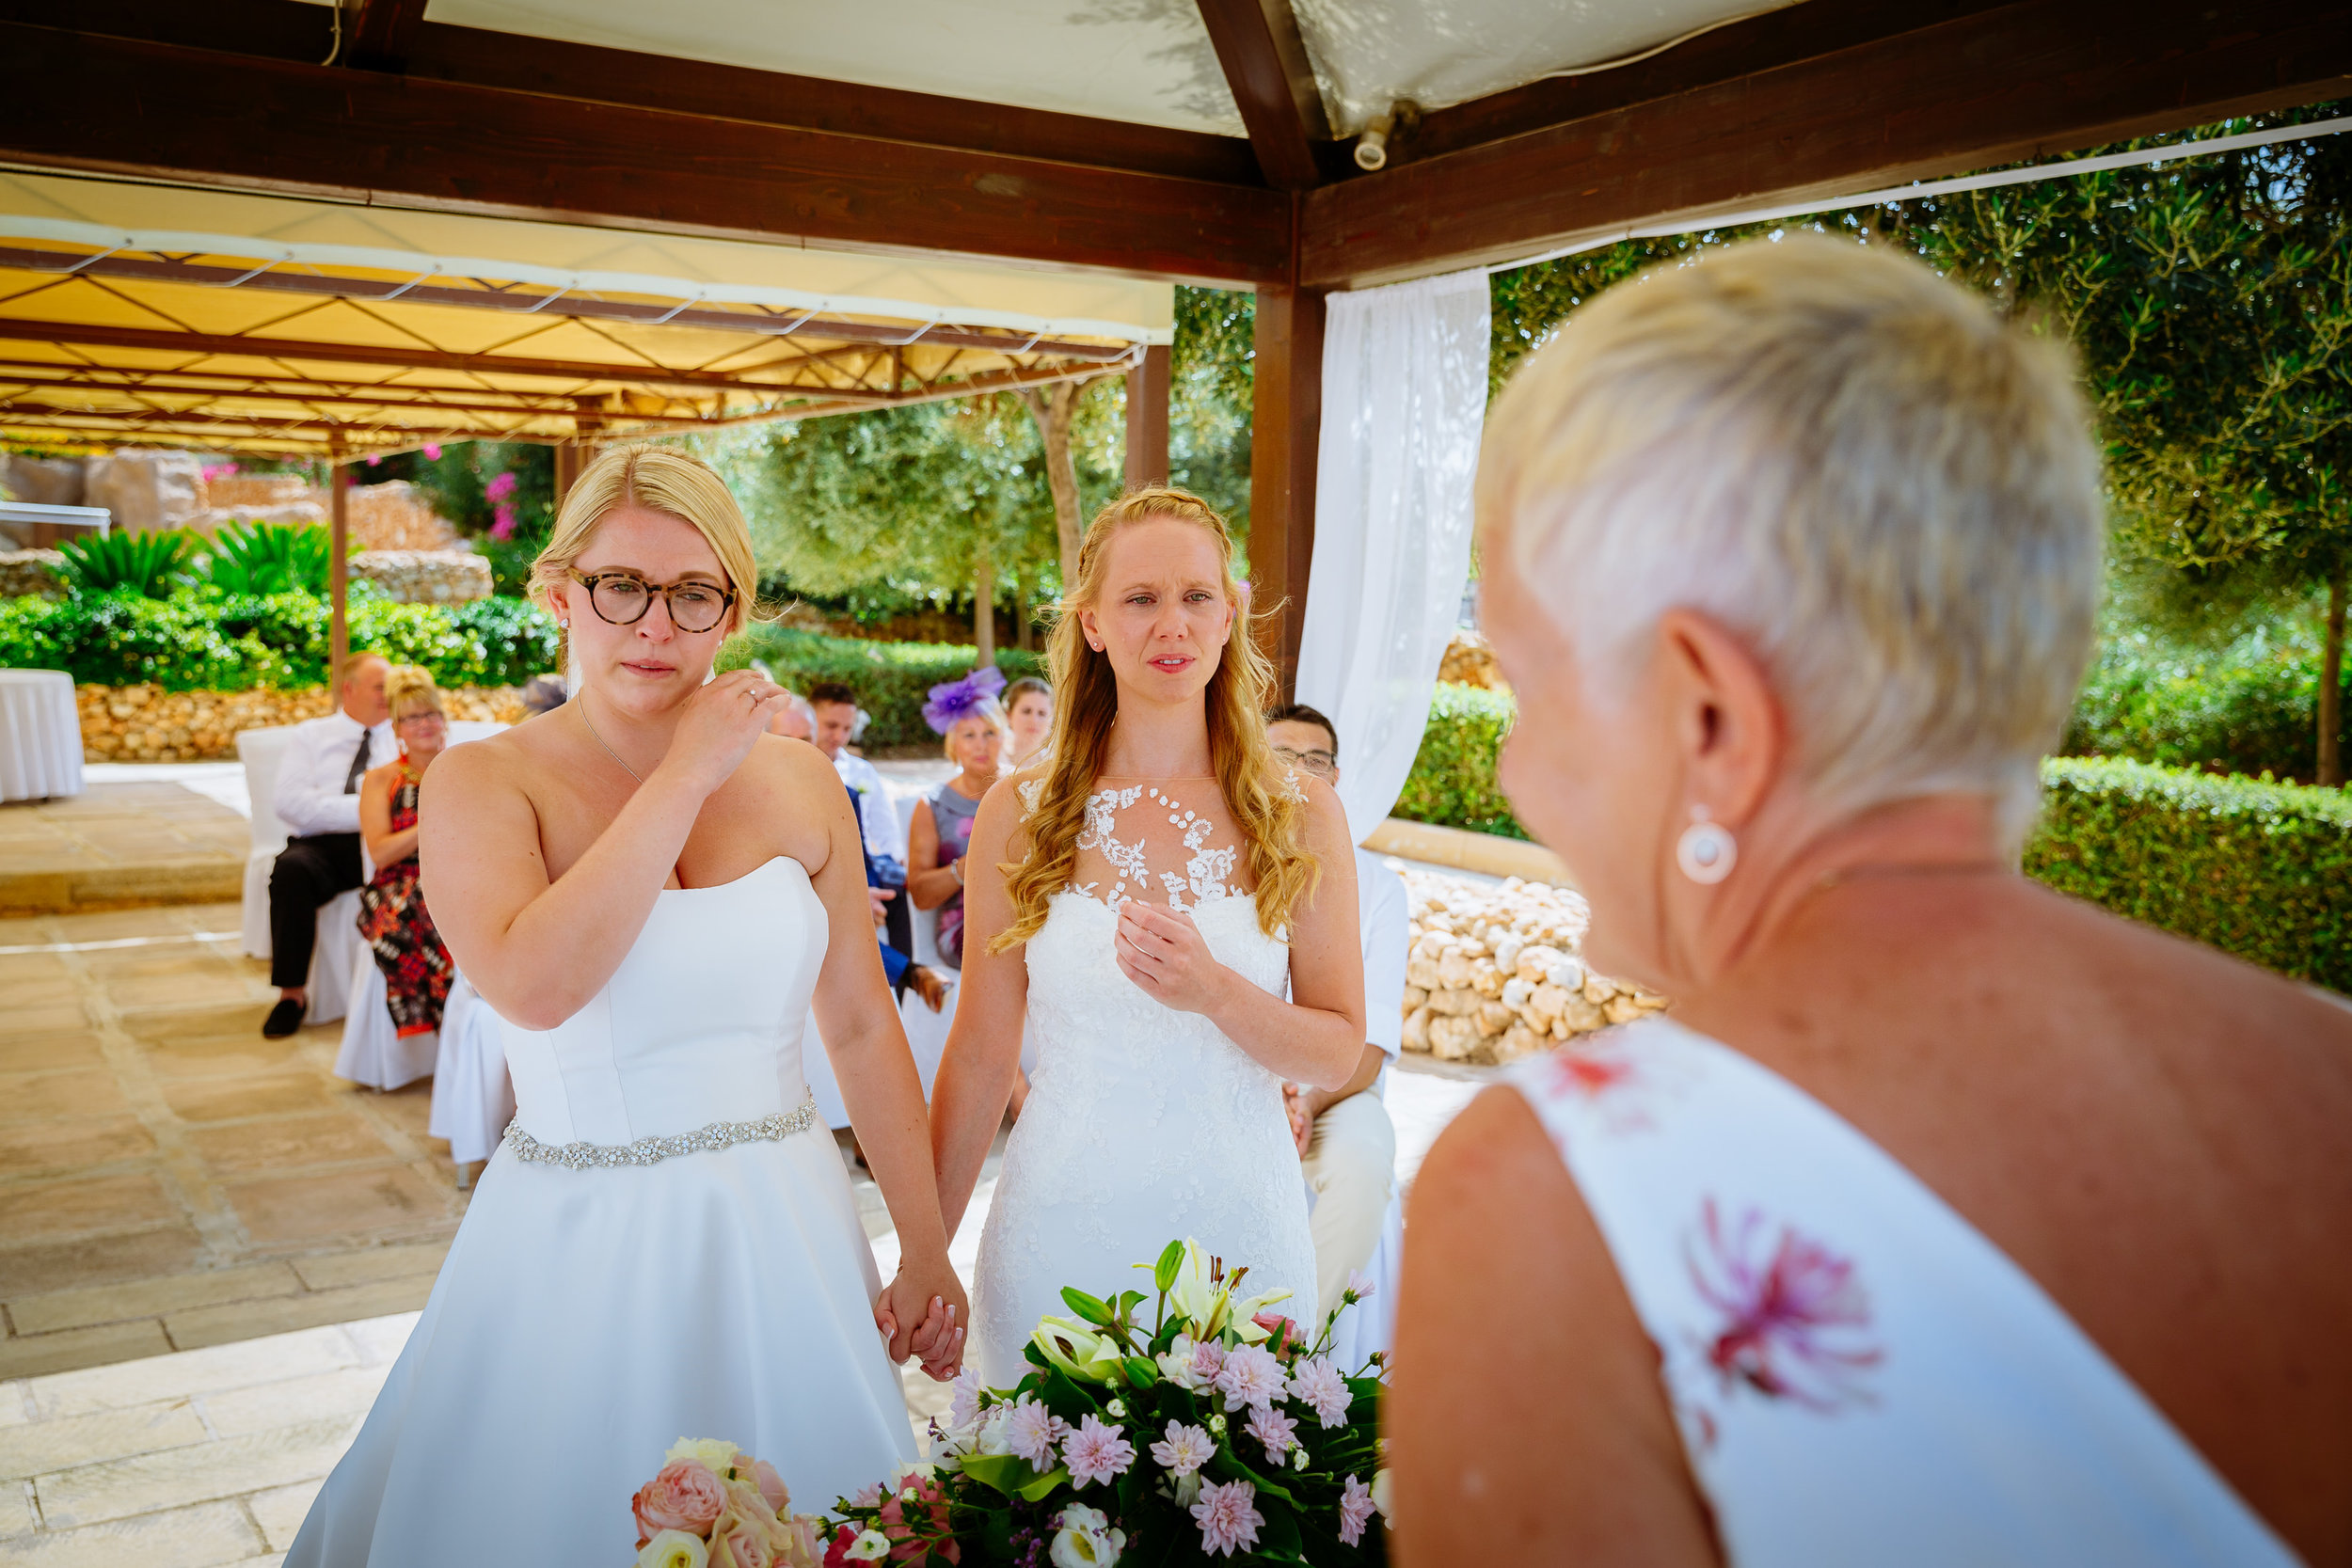 Malta_wedding_photography-61.jpg